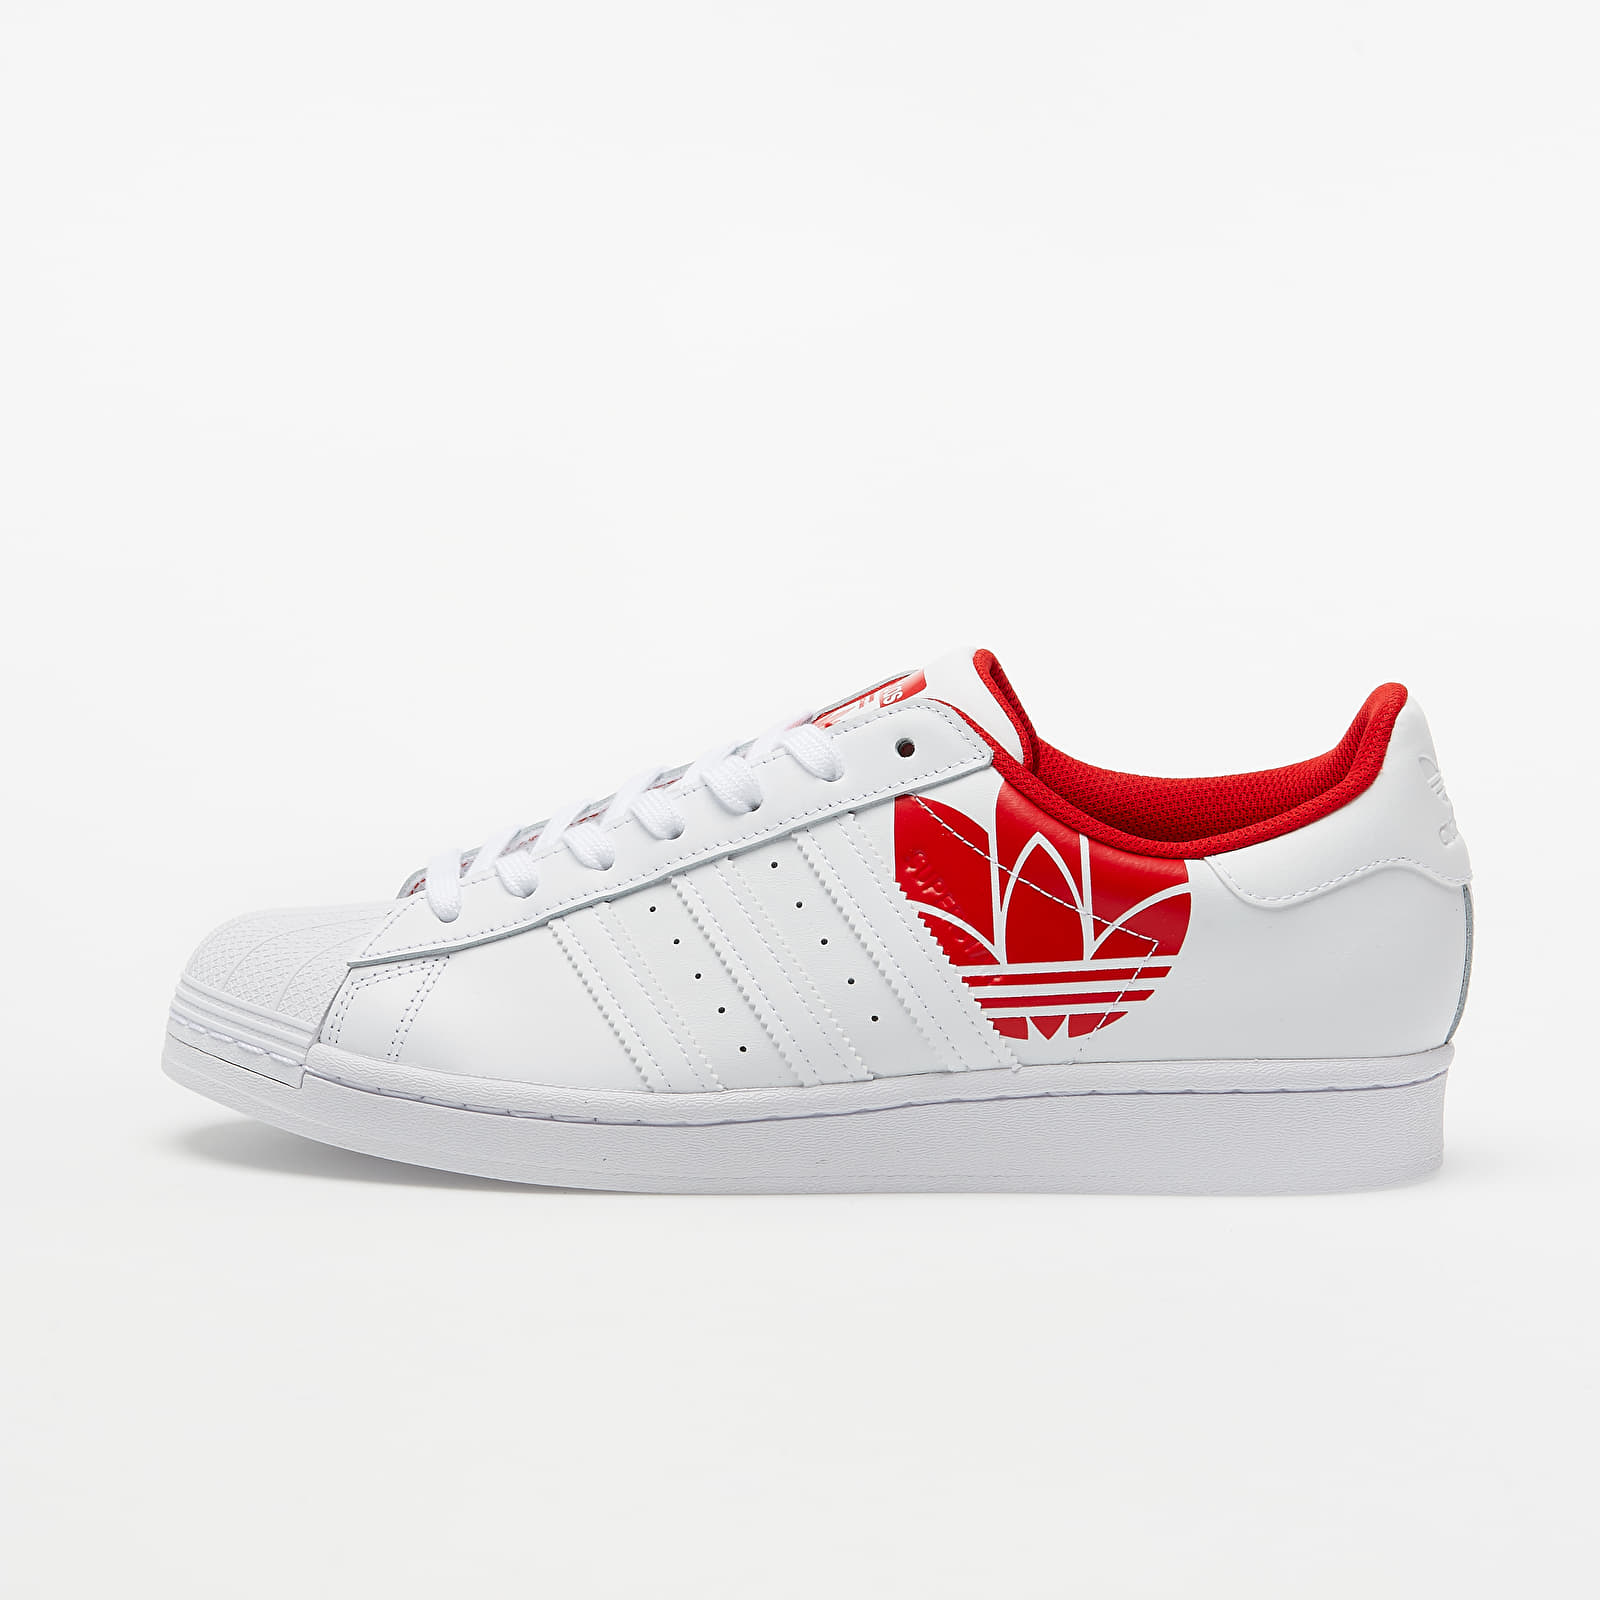 adidas Superstar Ftw White/ Ftw White/ Scarlet FY2828